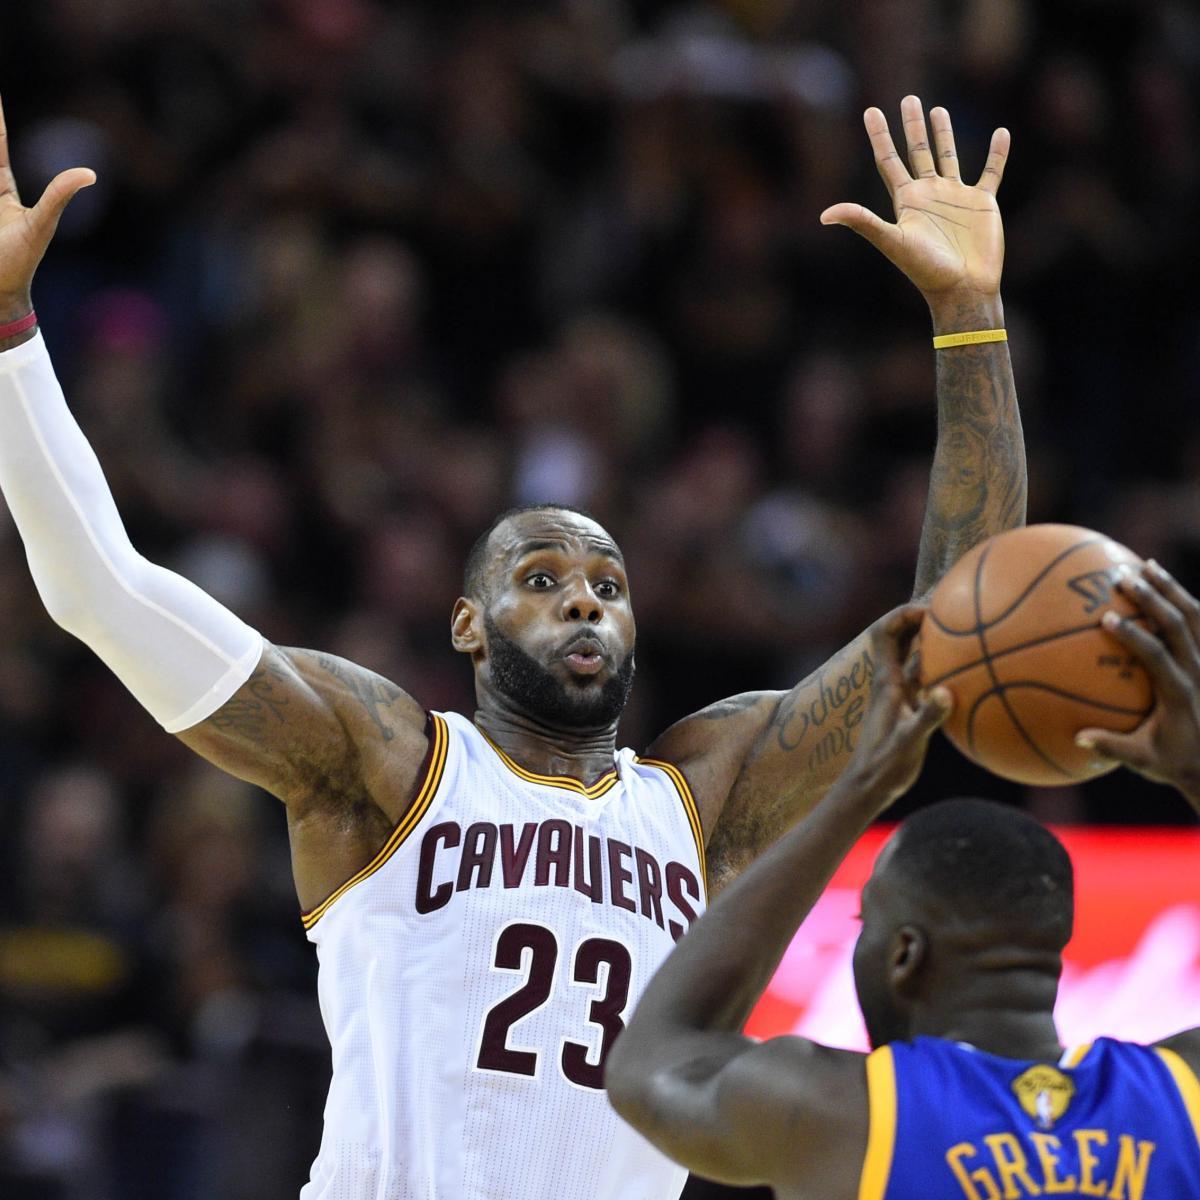 Cavaliers vs warriors game 7 predictions - Nba Finals 2016 Cavaliers Vs Warriors Game 7 Odds Props And Predictions Bleacher Report